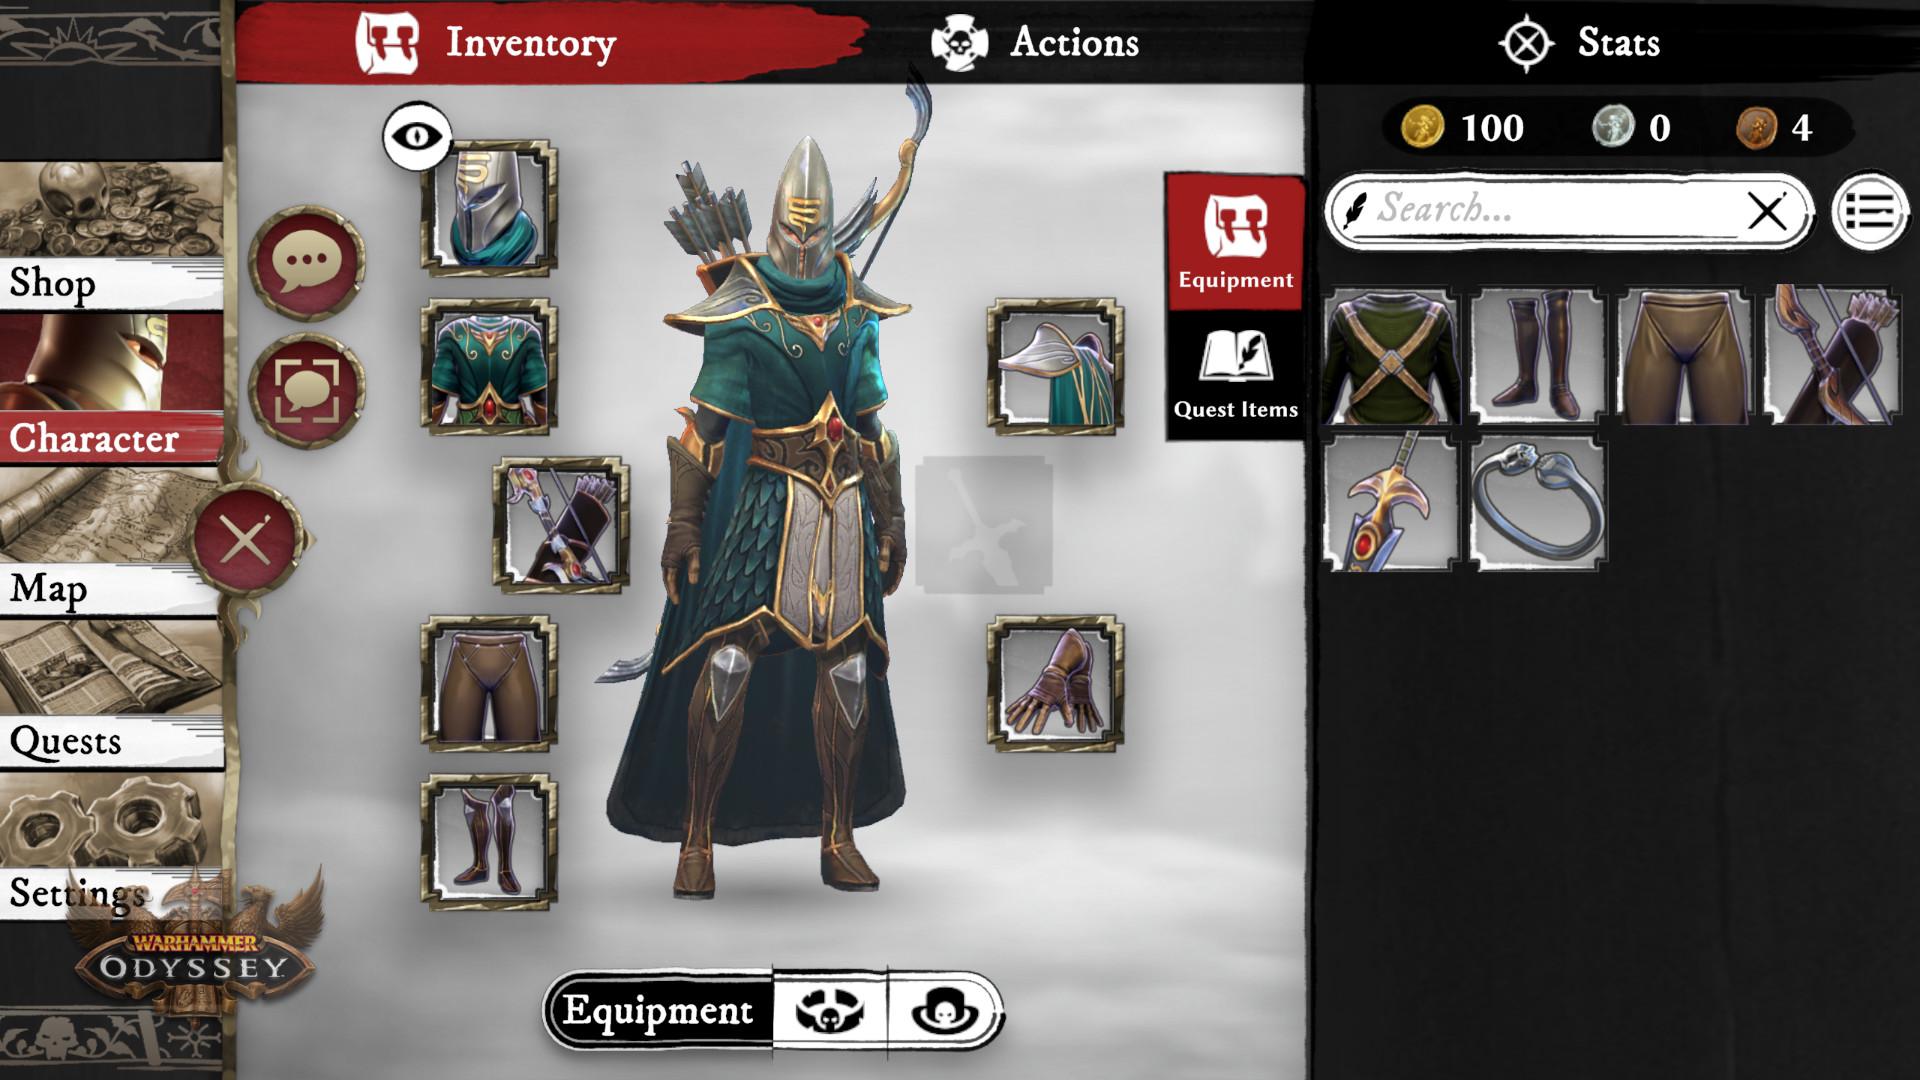 Warhammer: Odyssey screenshot 1